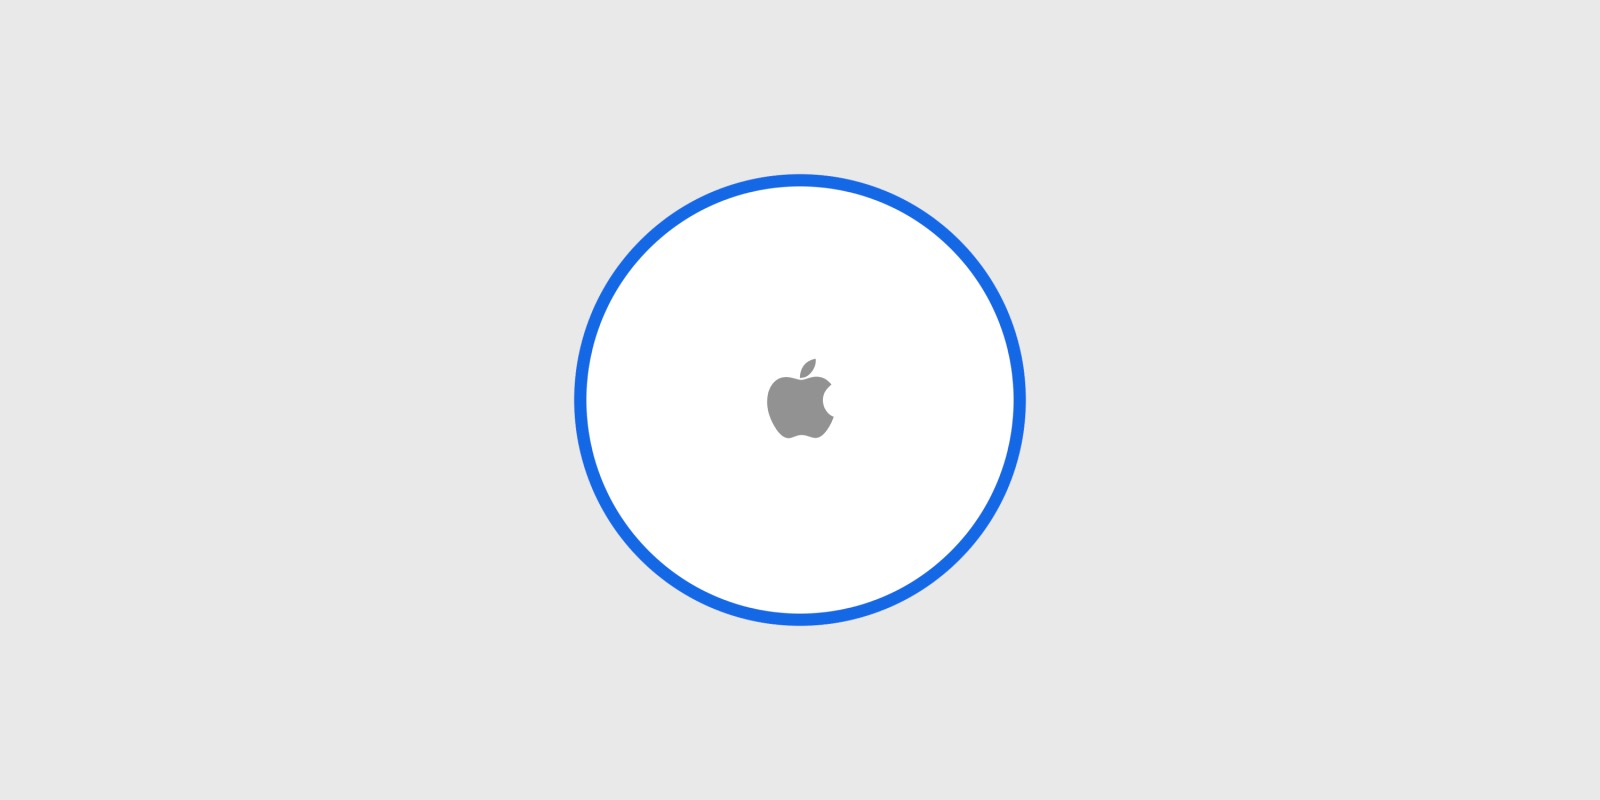 Apple、忘れ物を防止するスマートタグ開発か。「iOS 13」から発見される